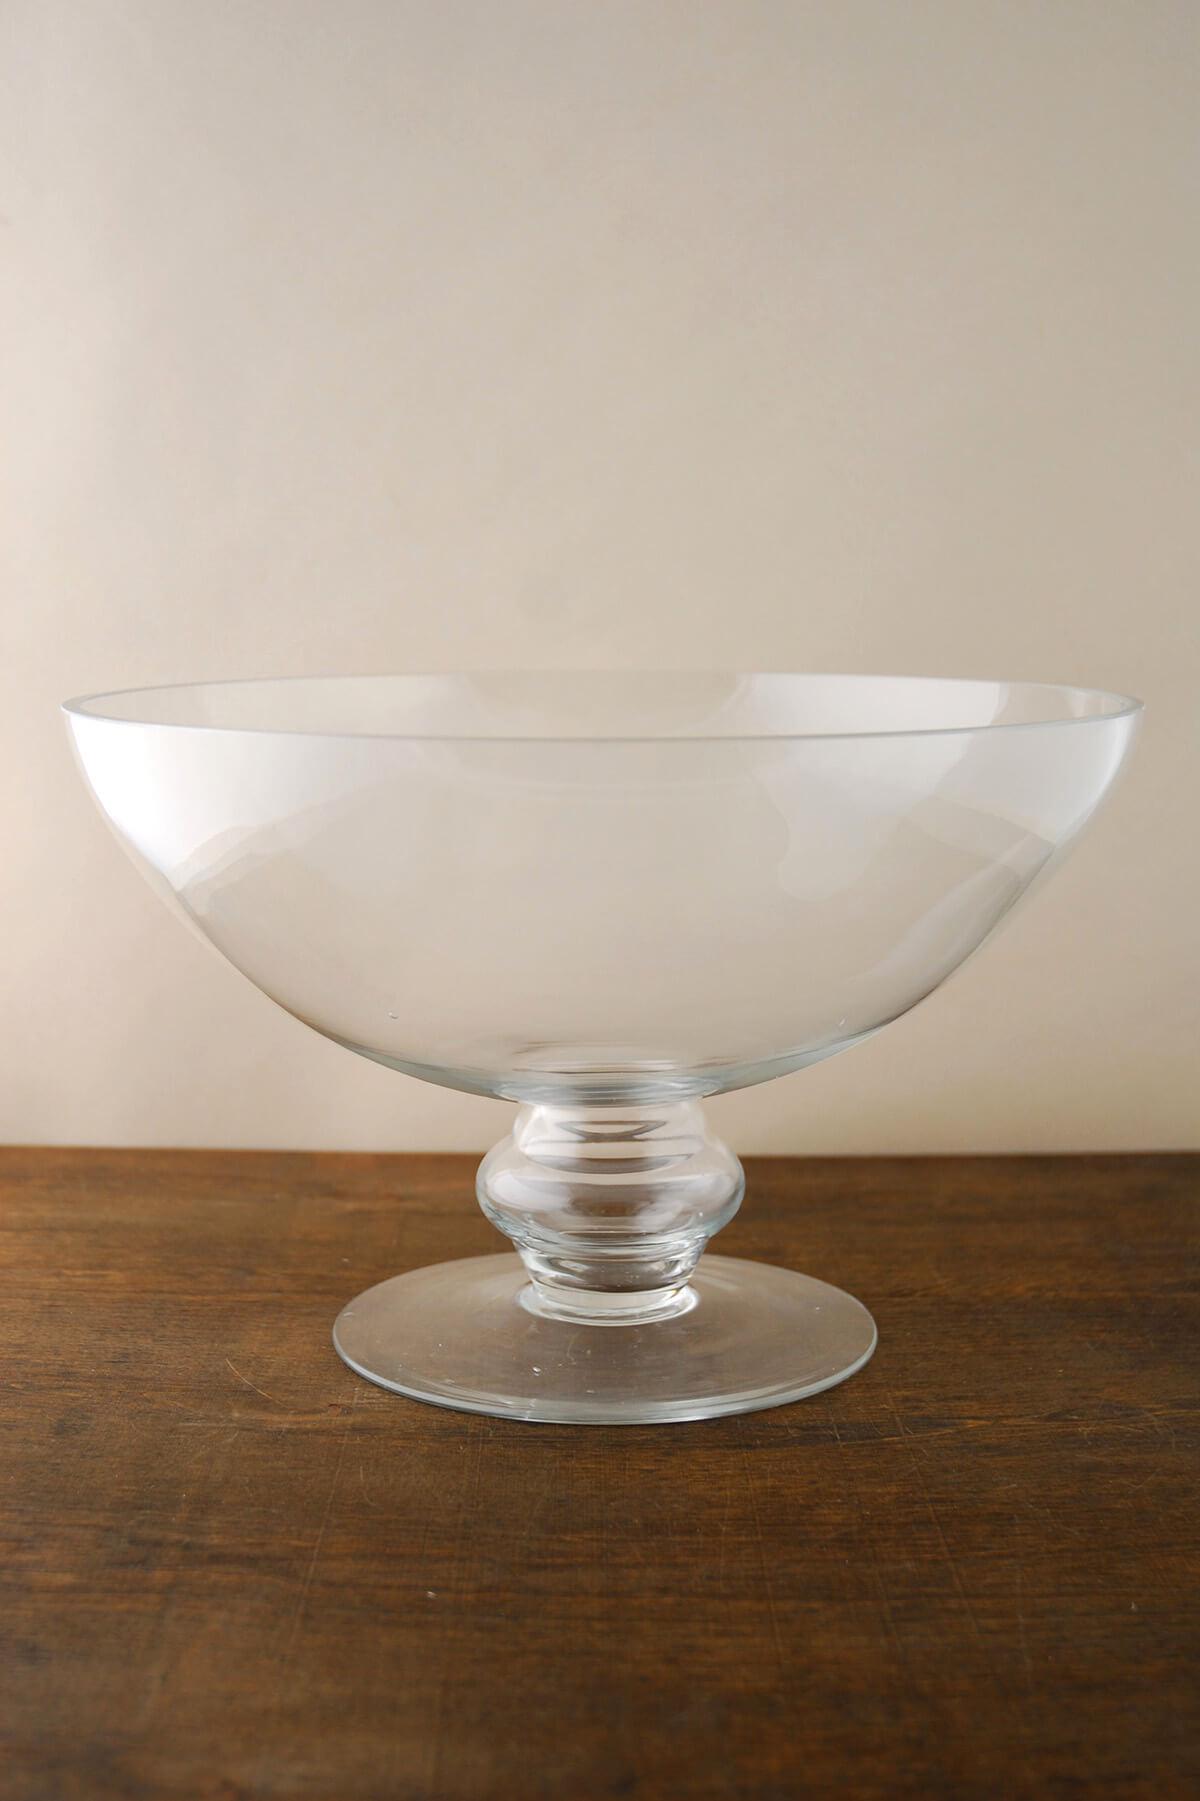 Floating flower bowl